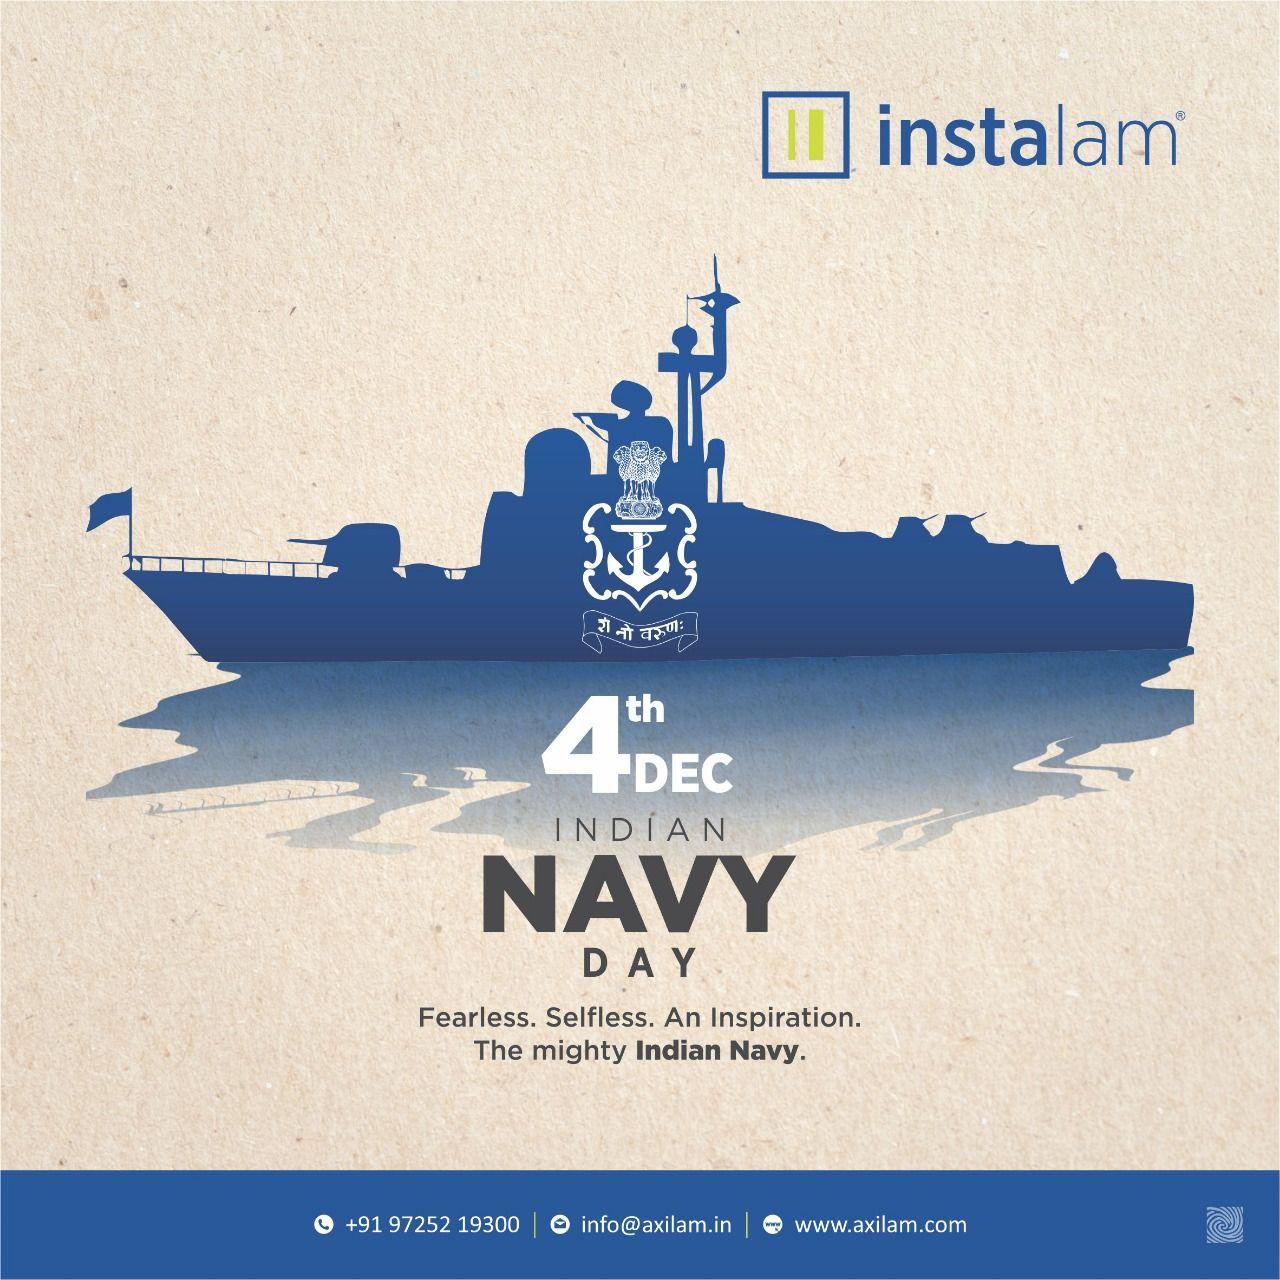 Axilam Laminates Indian Navy Day Navy Day Indian Navy